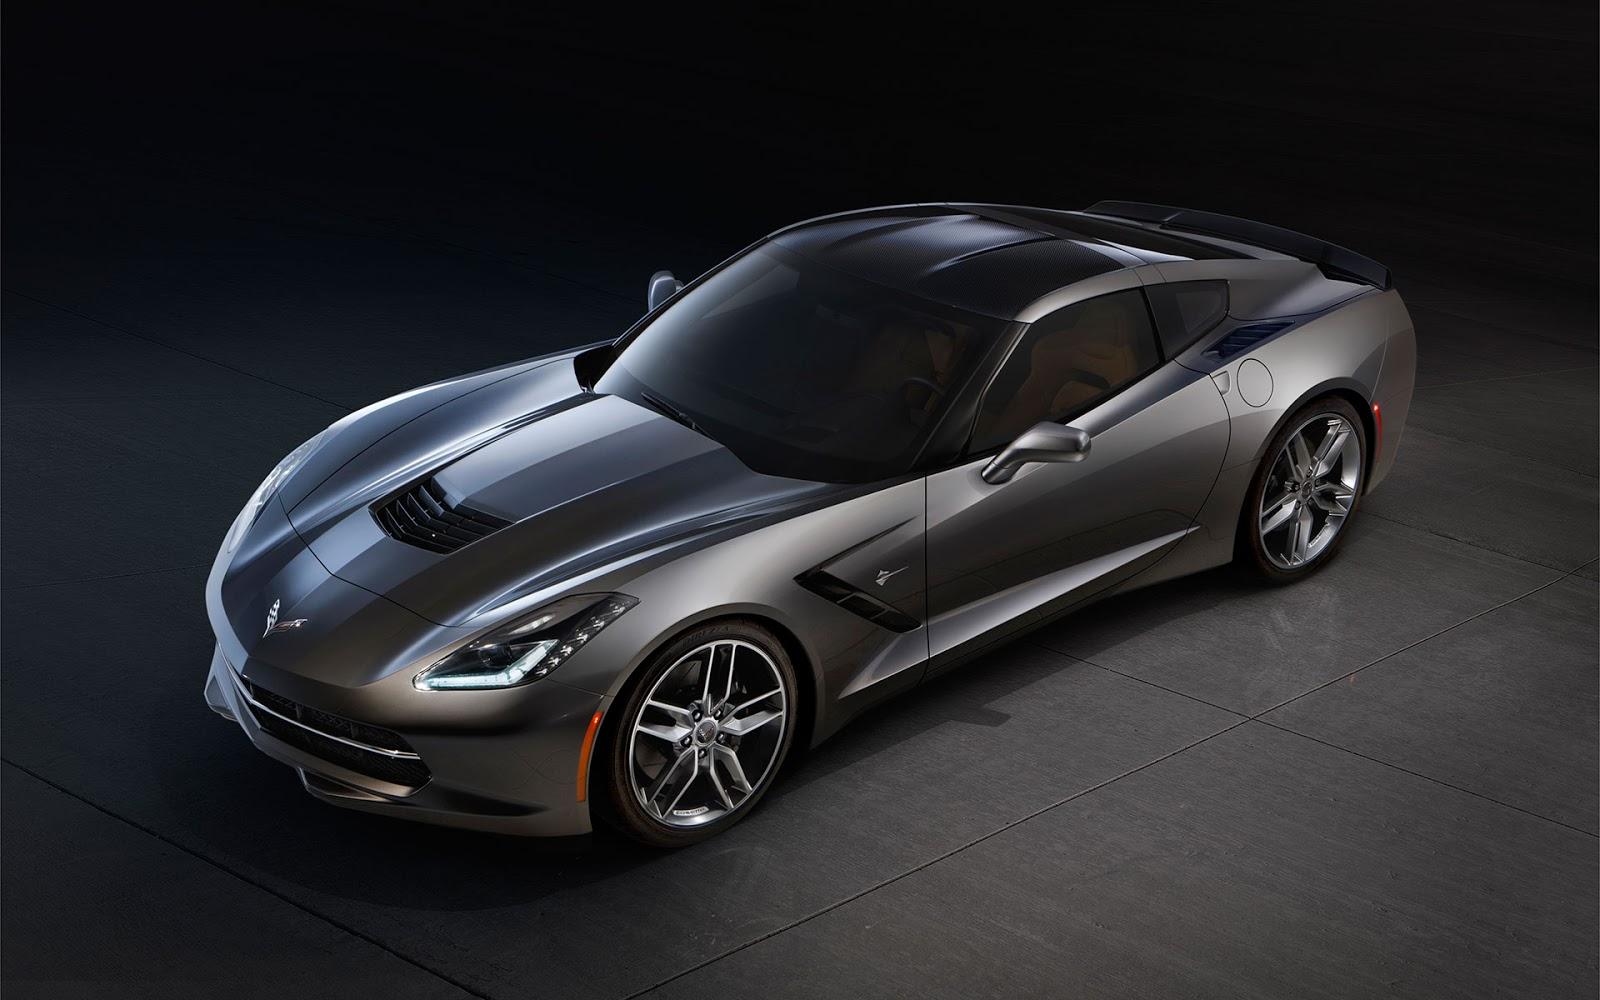 Images of Corvette C7 Zr1 Wallpaper - #SC